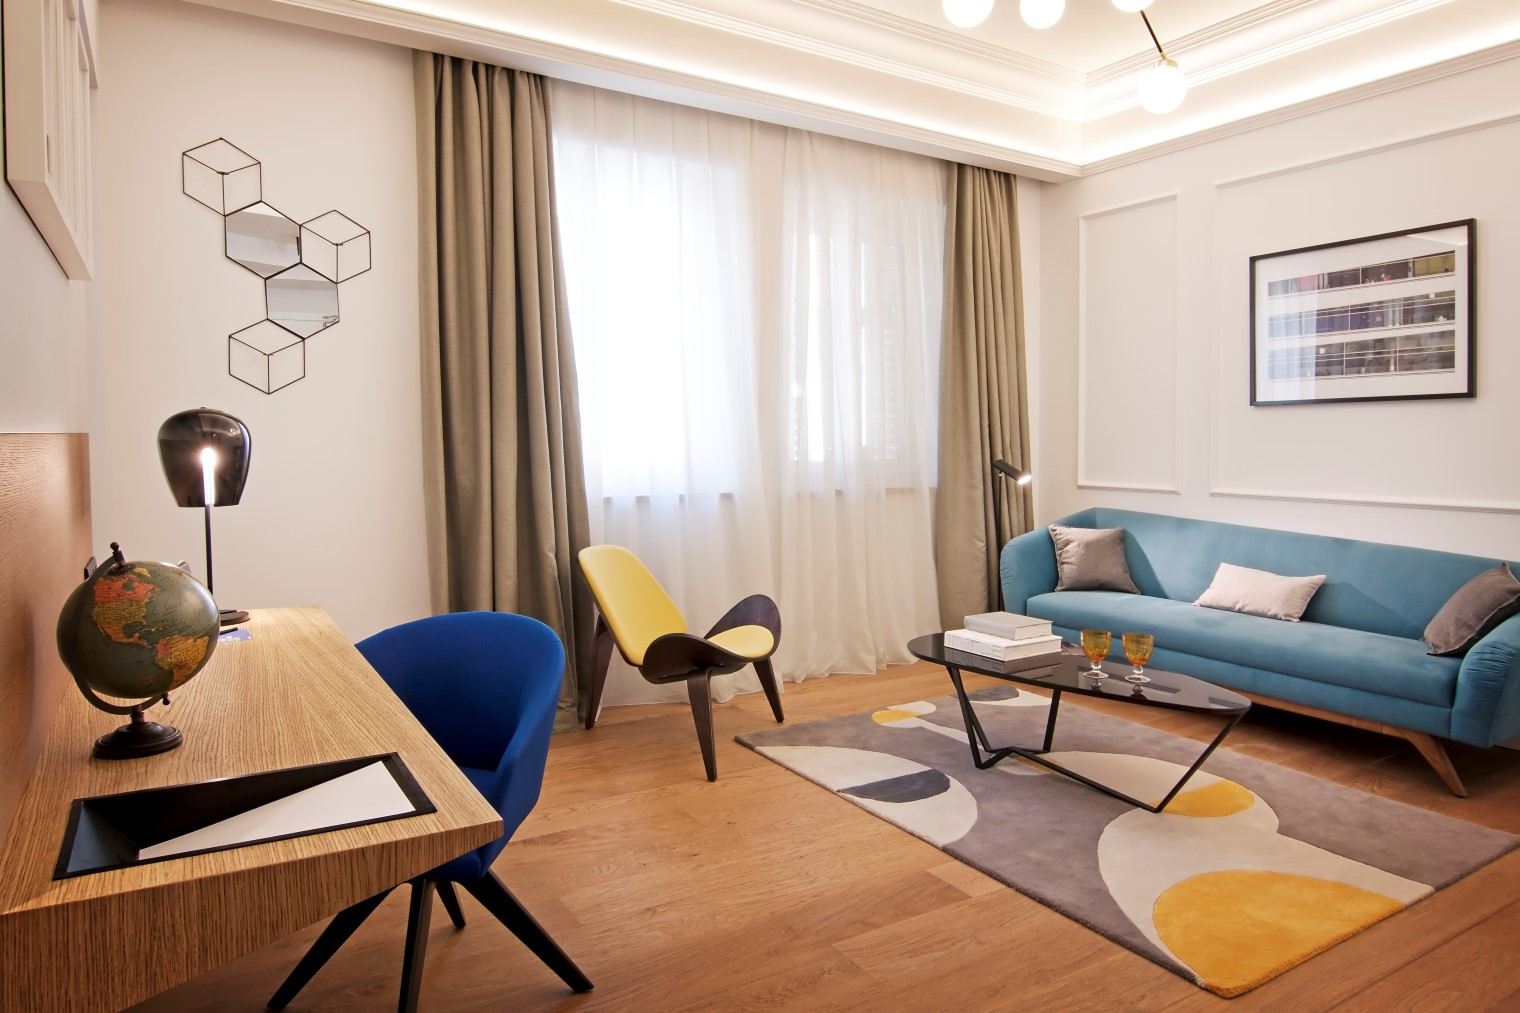 Hotel one shot palacio reina victoria for Design hotel valencia spain